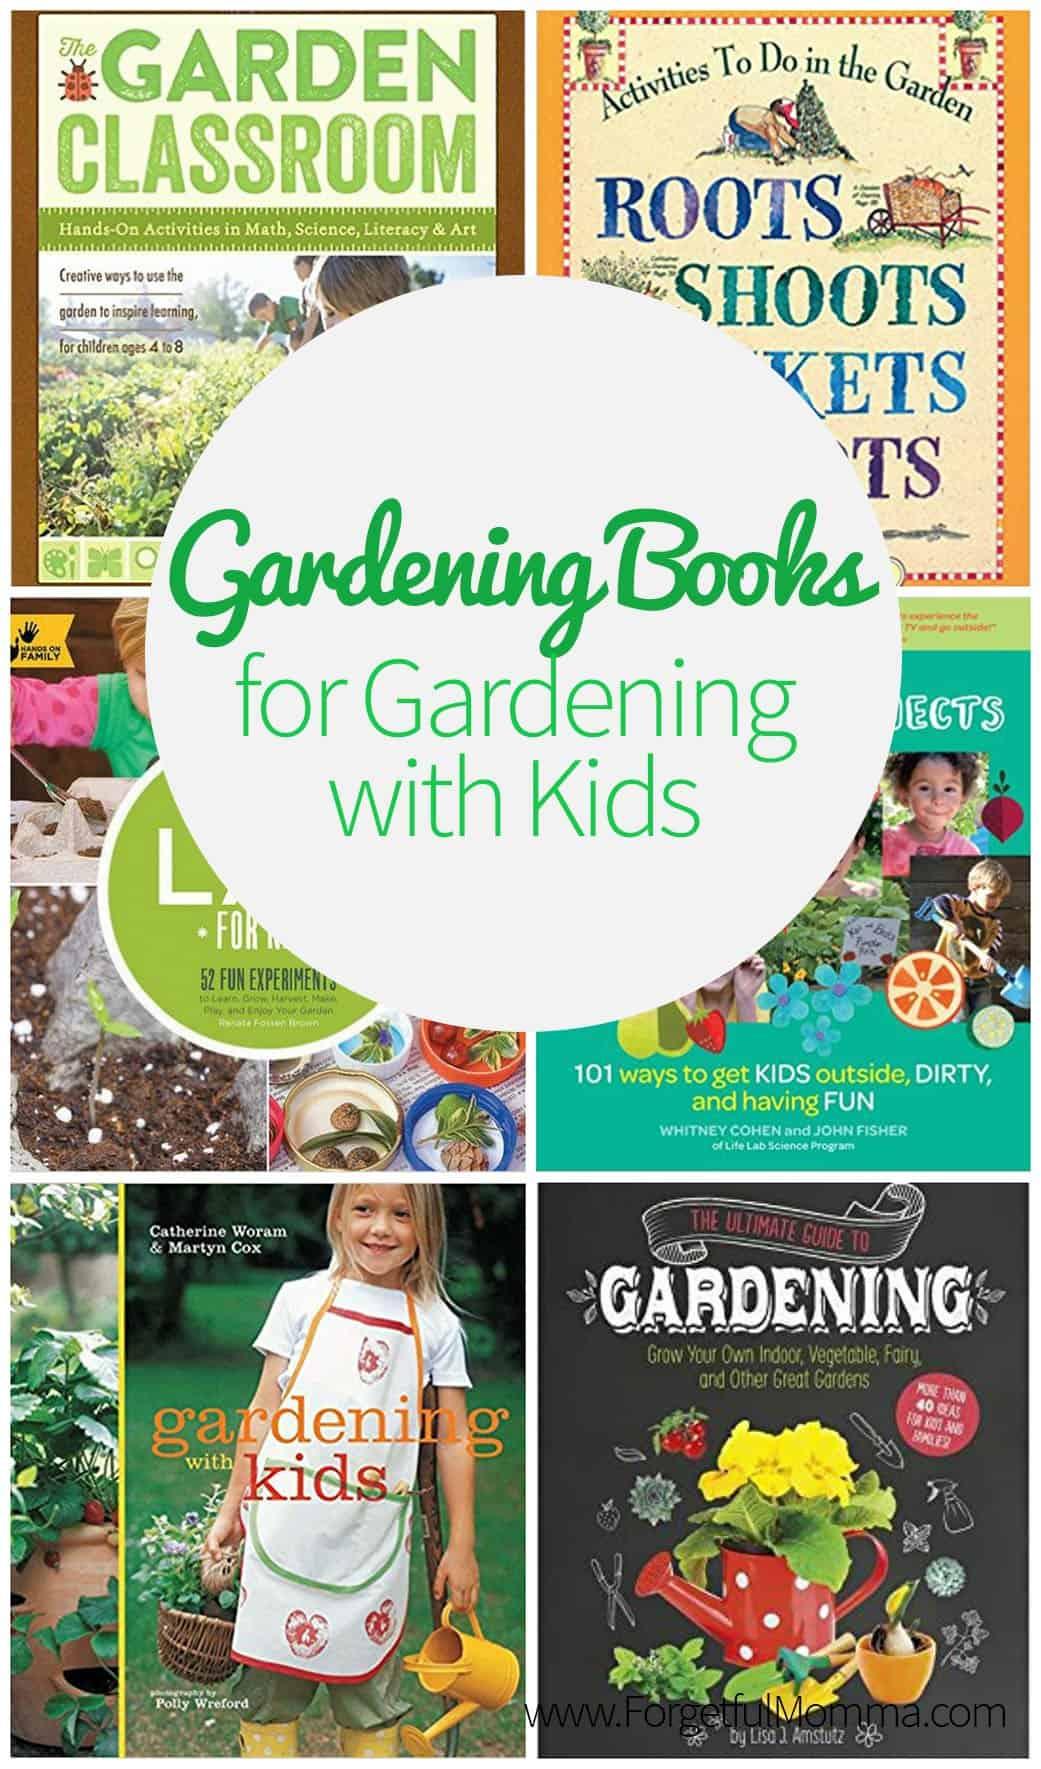 Gardening Books for Gardening with Kids